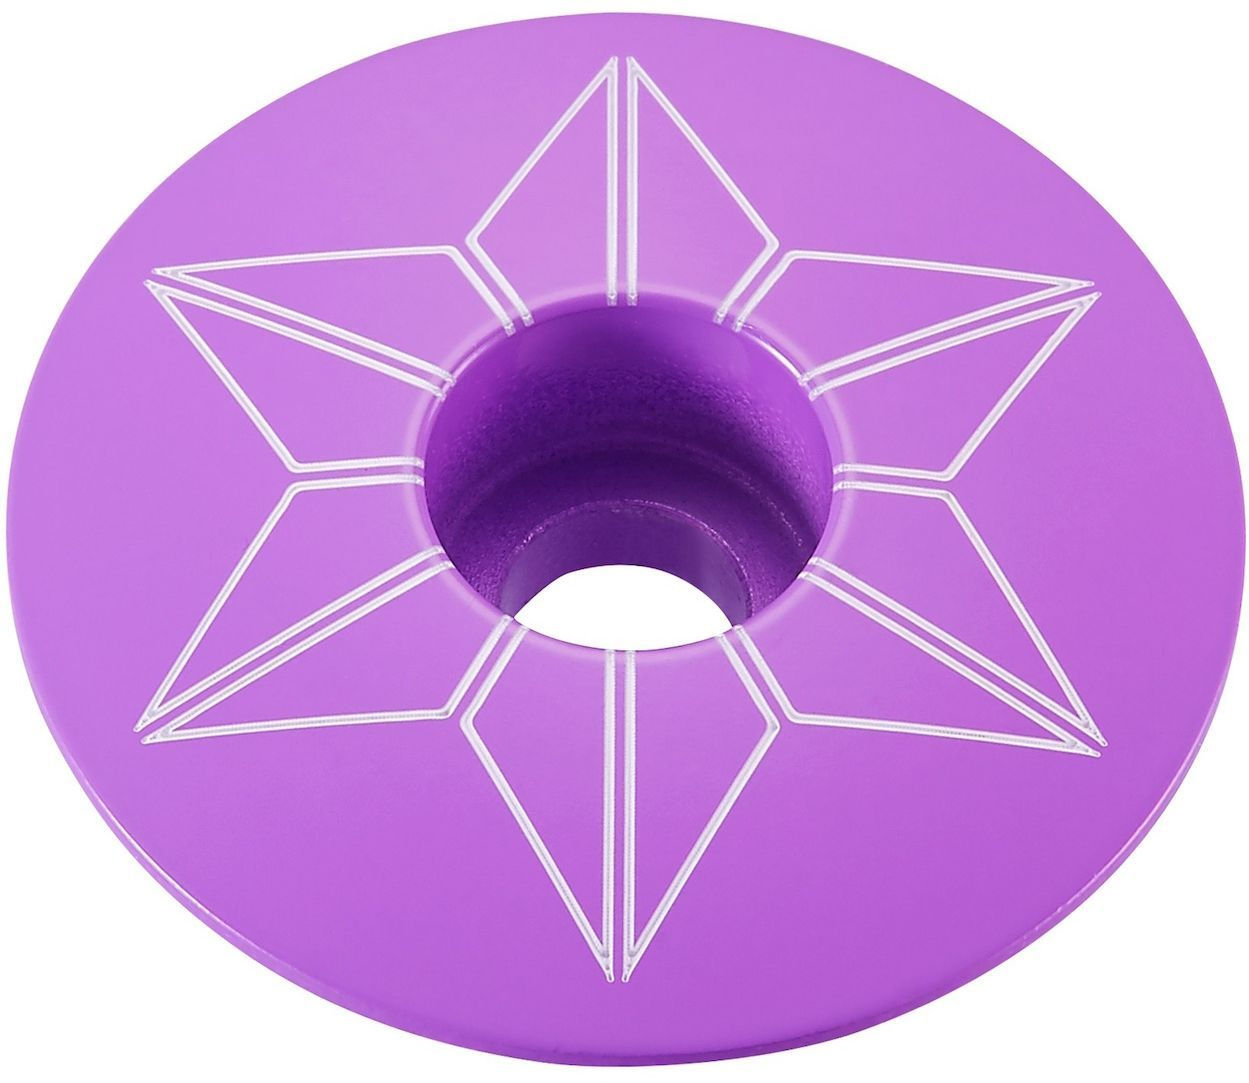 Supacaz Star Capz - Powder Coated - Neon Purple (powder coated) uni